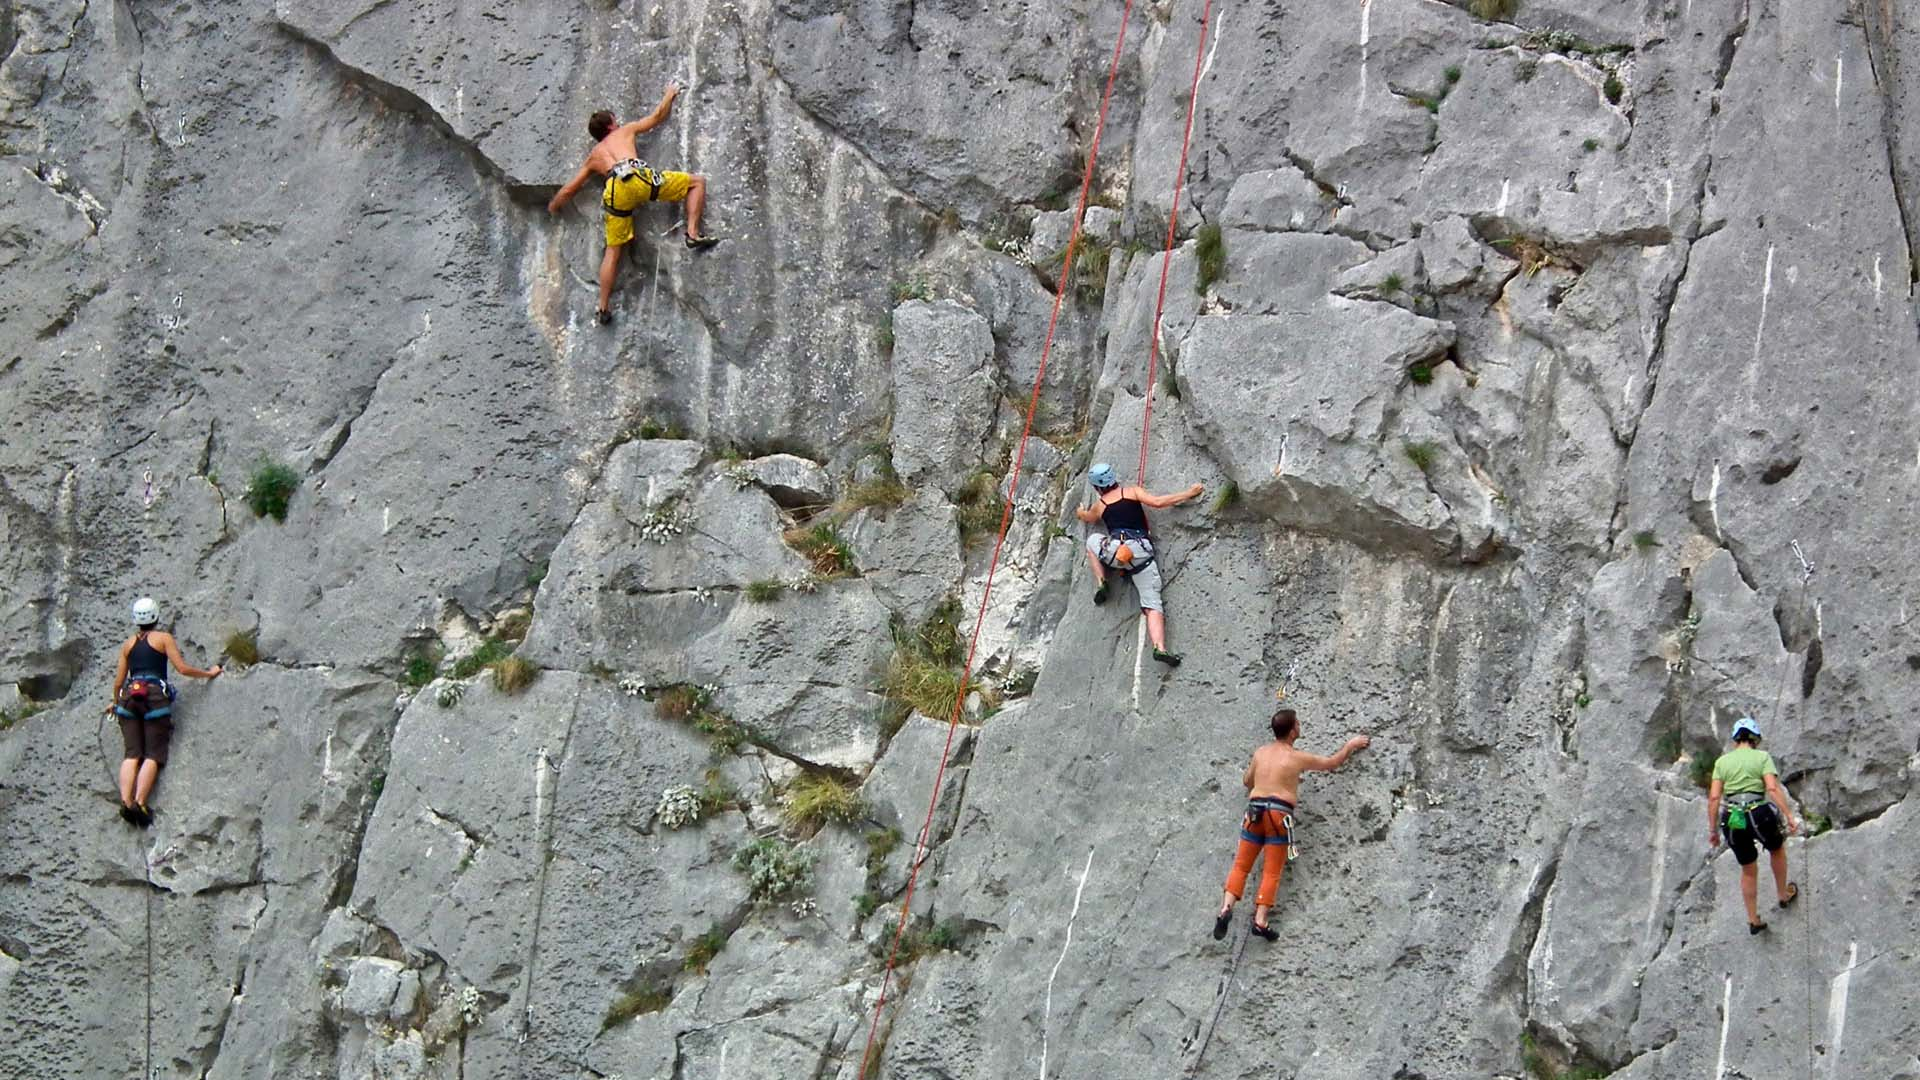 Omis free climbing